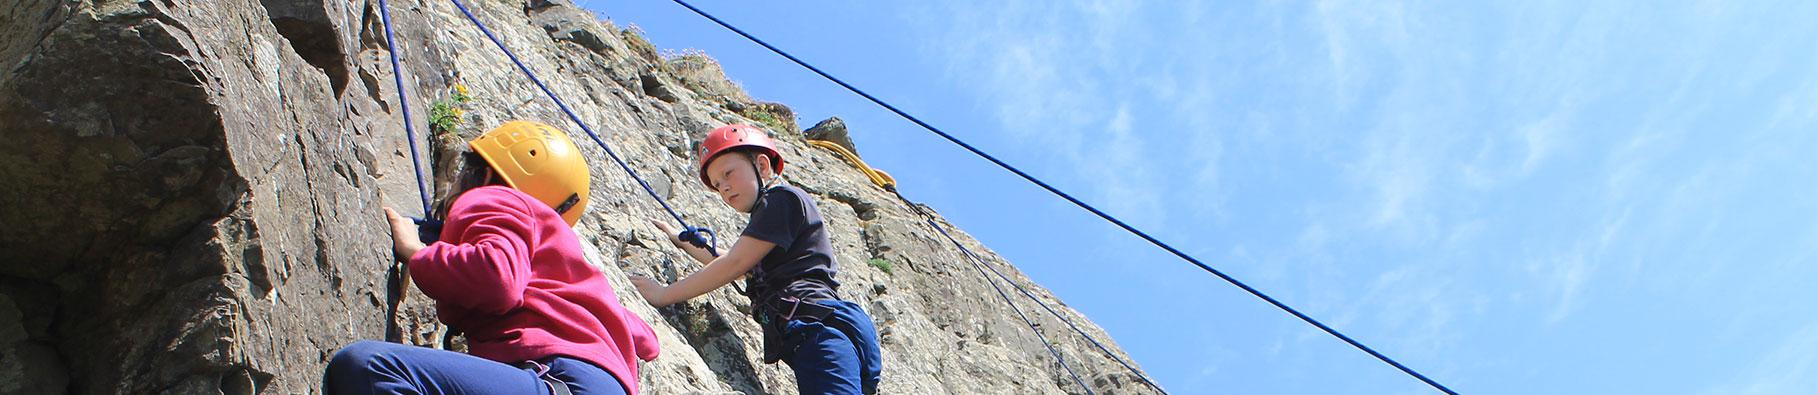 Rock climbing activity at Shoreline in Bude, Cornwall